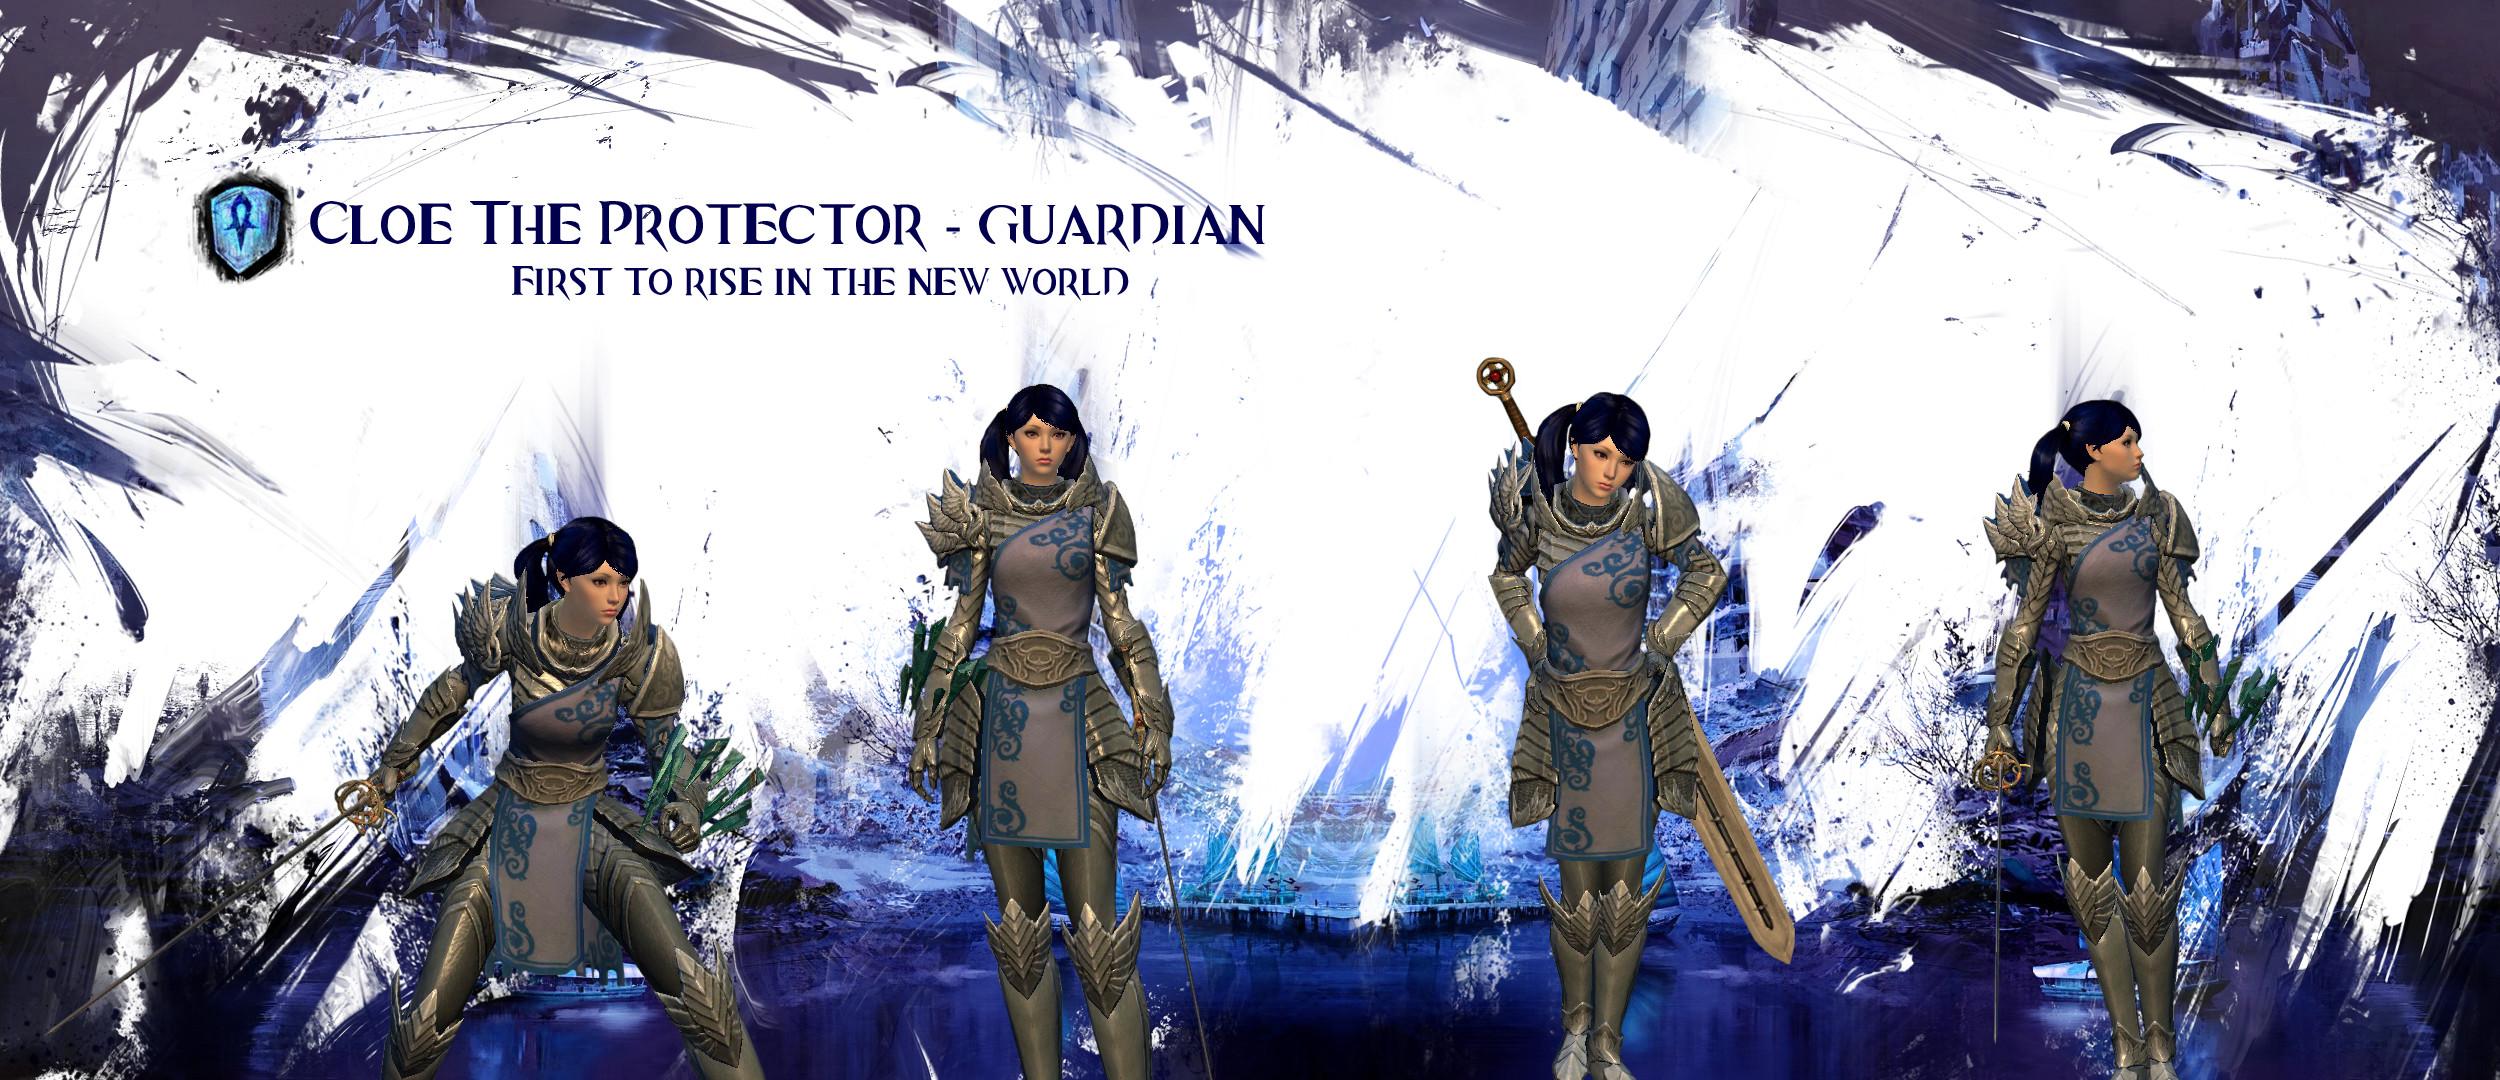 Guild Wars 2 Guardian Wallpaper (75+ pictures)